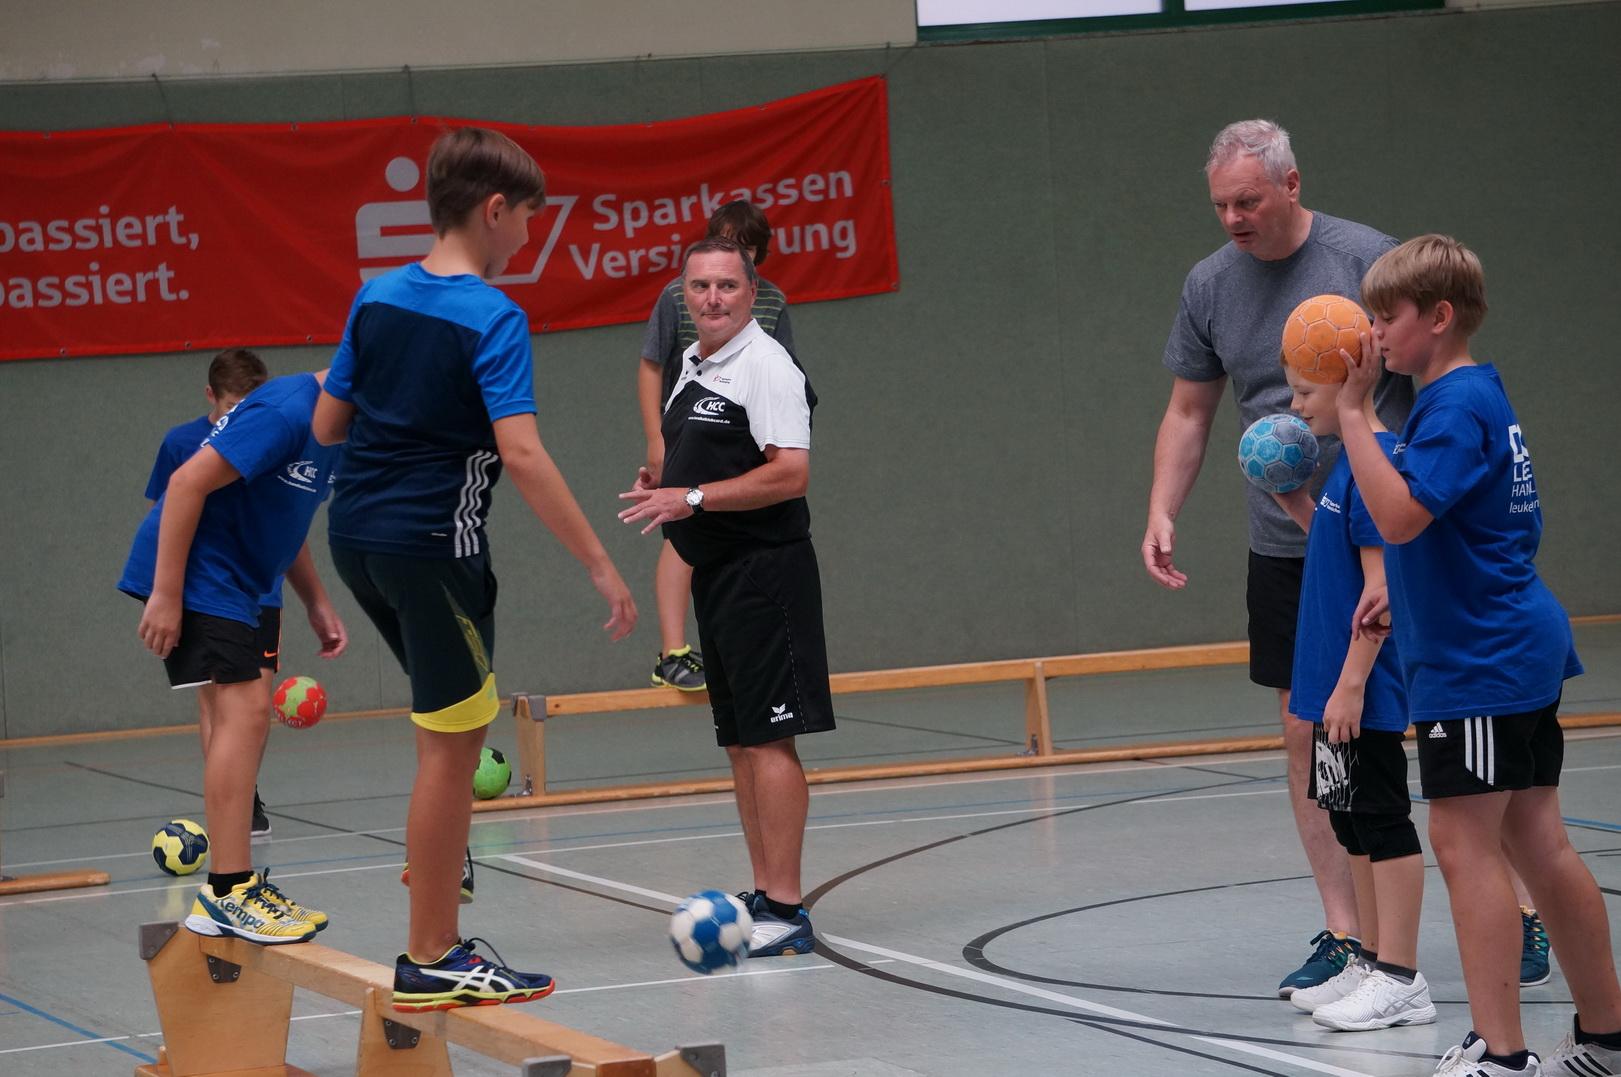 201808_Handballcamp_SDH_MG_175w